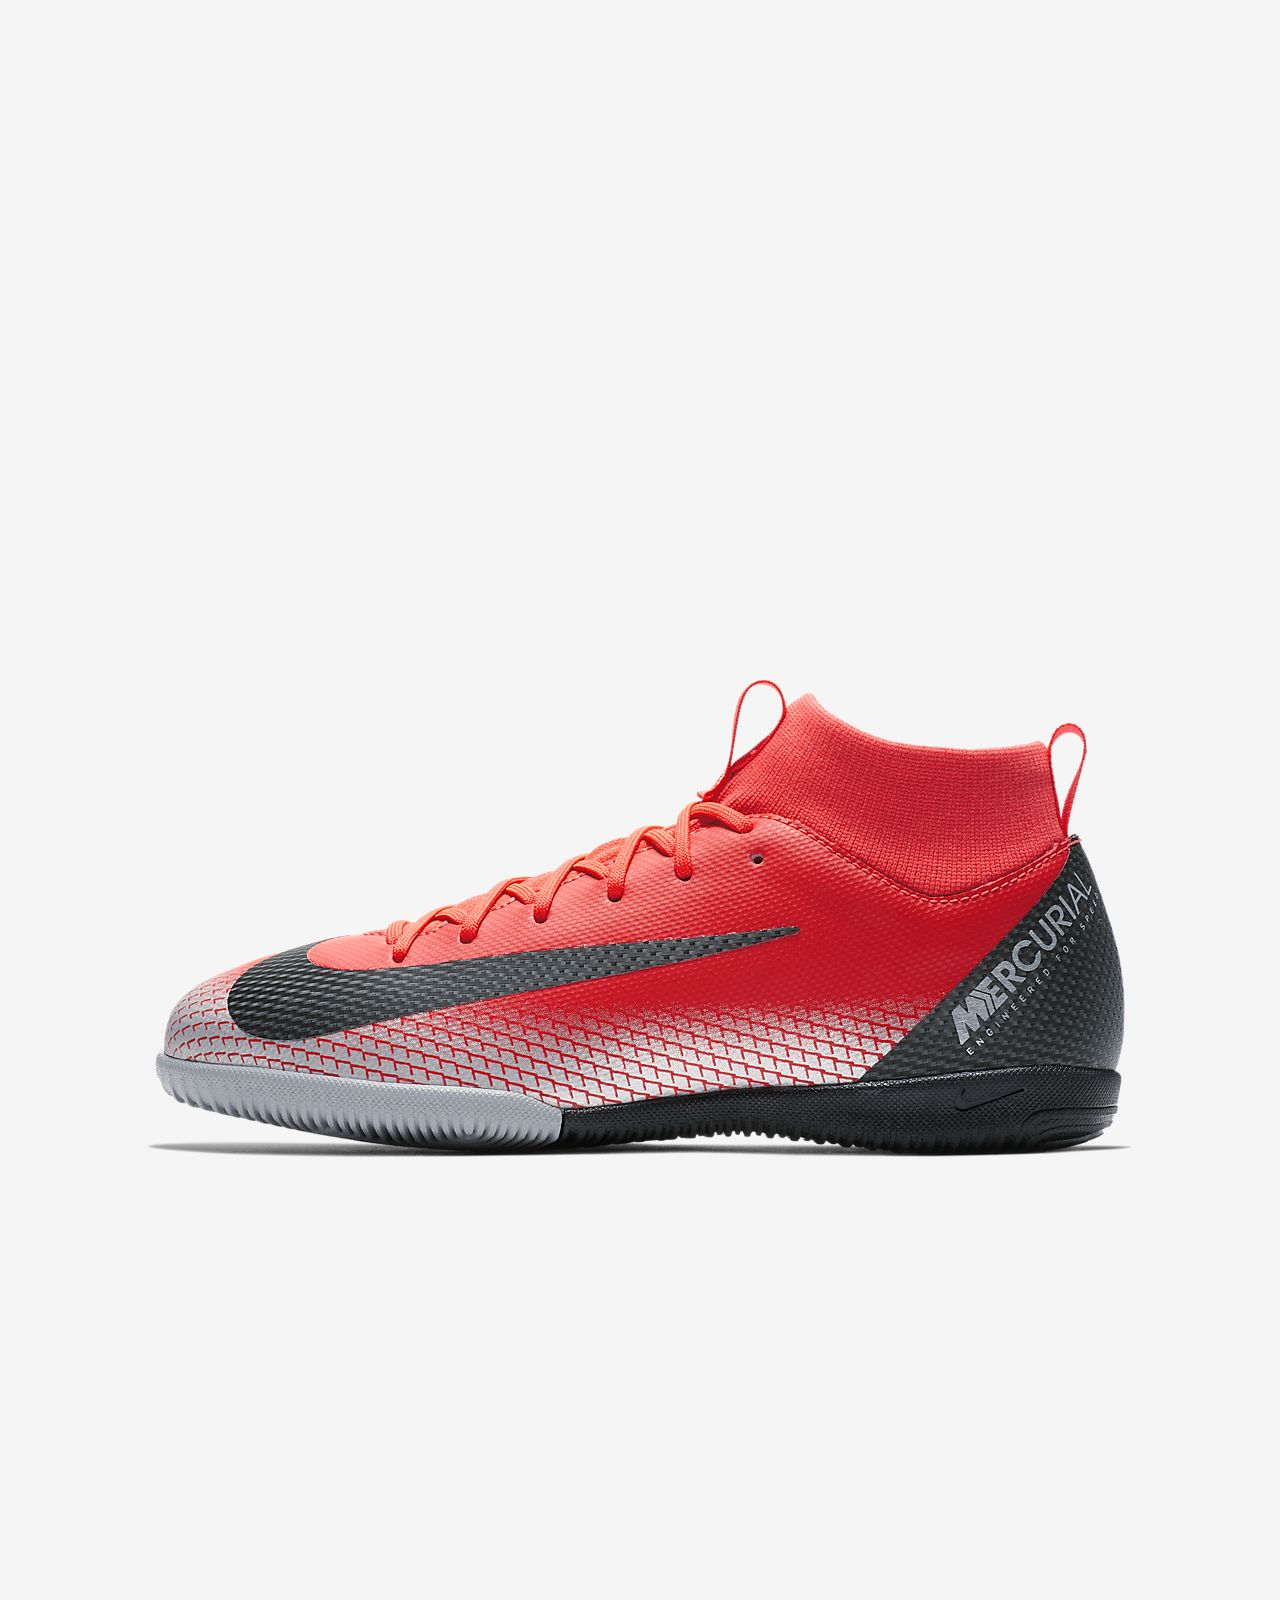 CR7 Jr. SuperflyX 6 Academy IC Botas de fútbol sala - Niño a. Nike ... 10b599747af0e